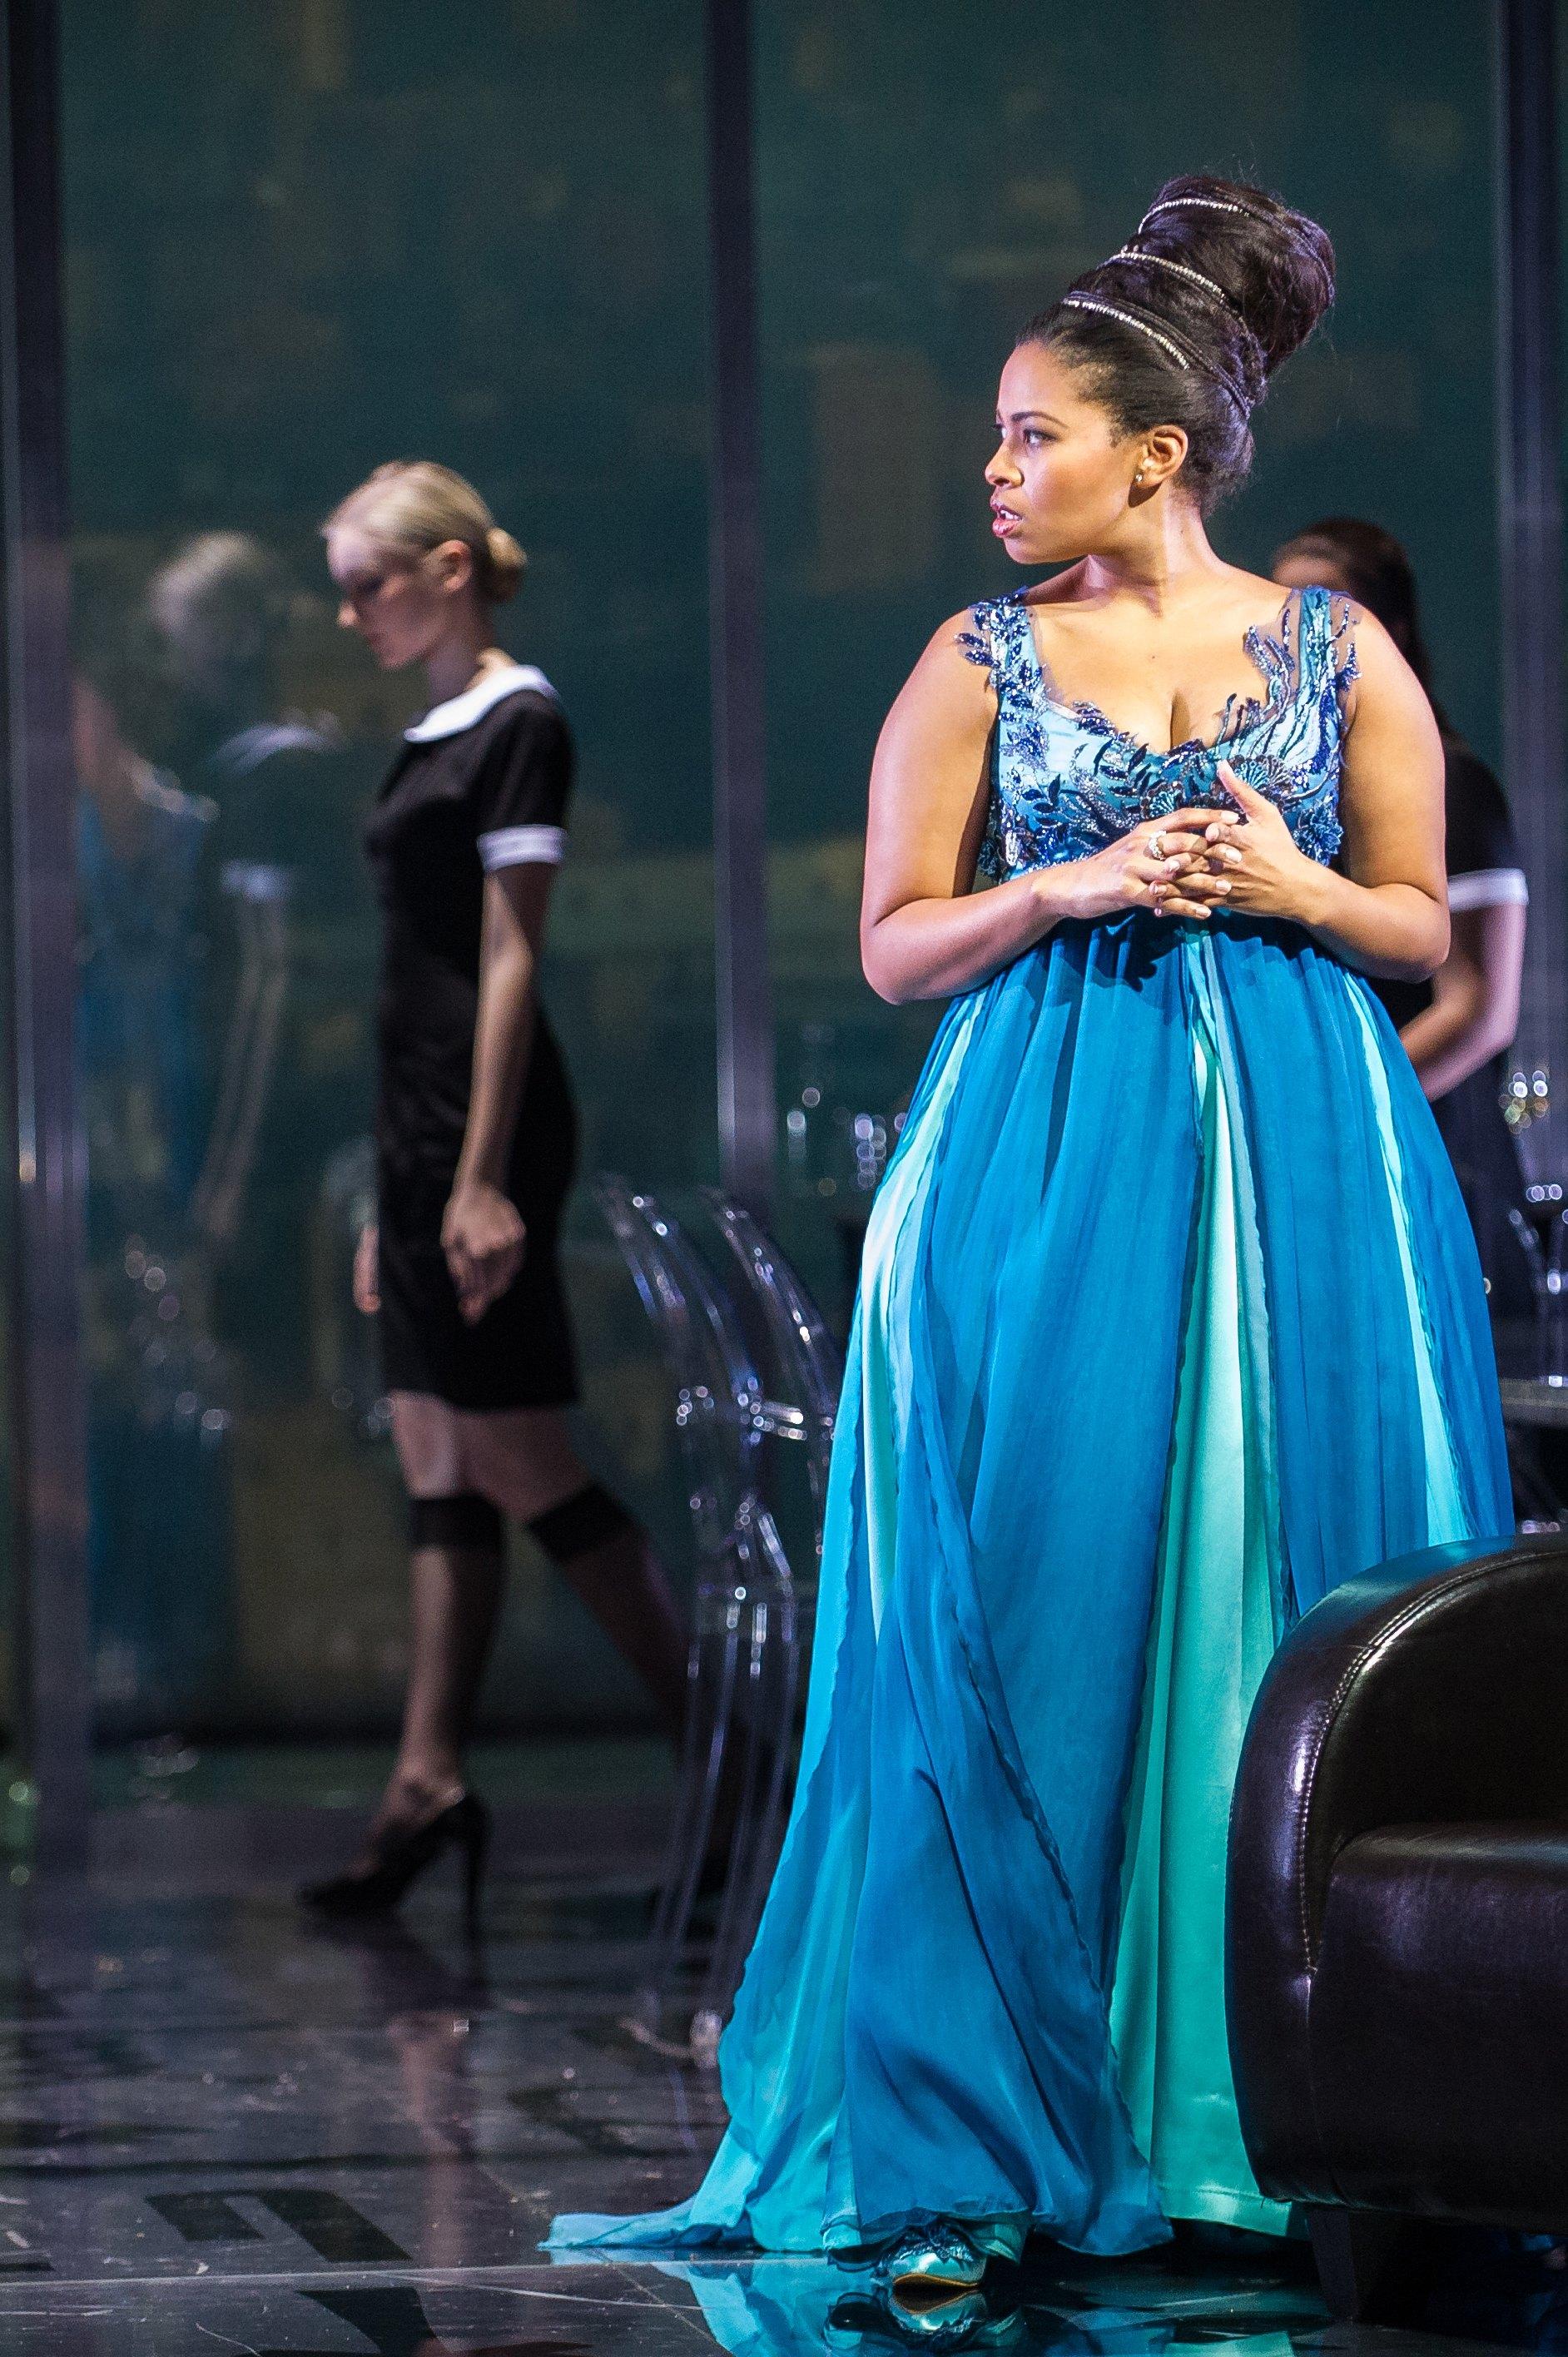 Cleopatra in  Guilio Cesare  at Stadttheater Klagenfurt, February 2014. Photo by Karlheinz Fessl.